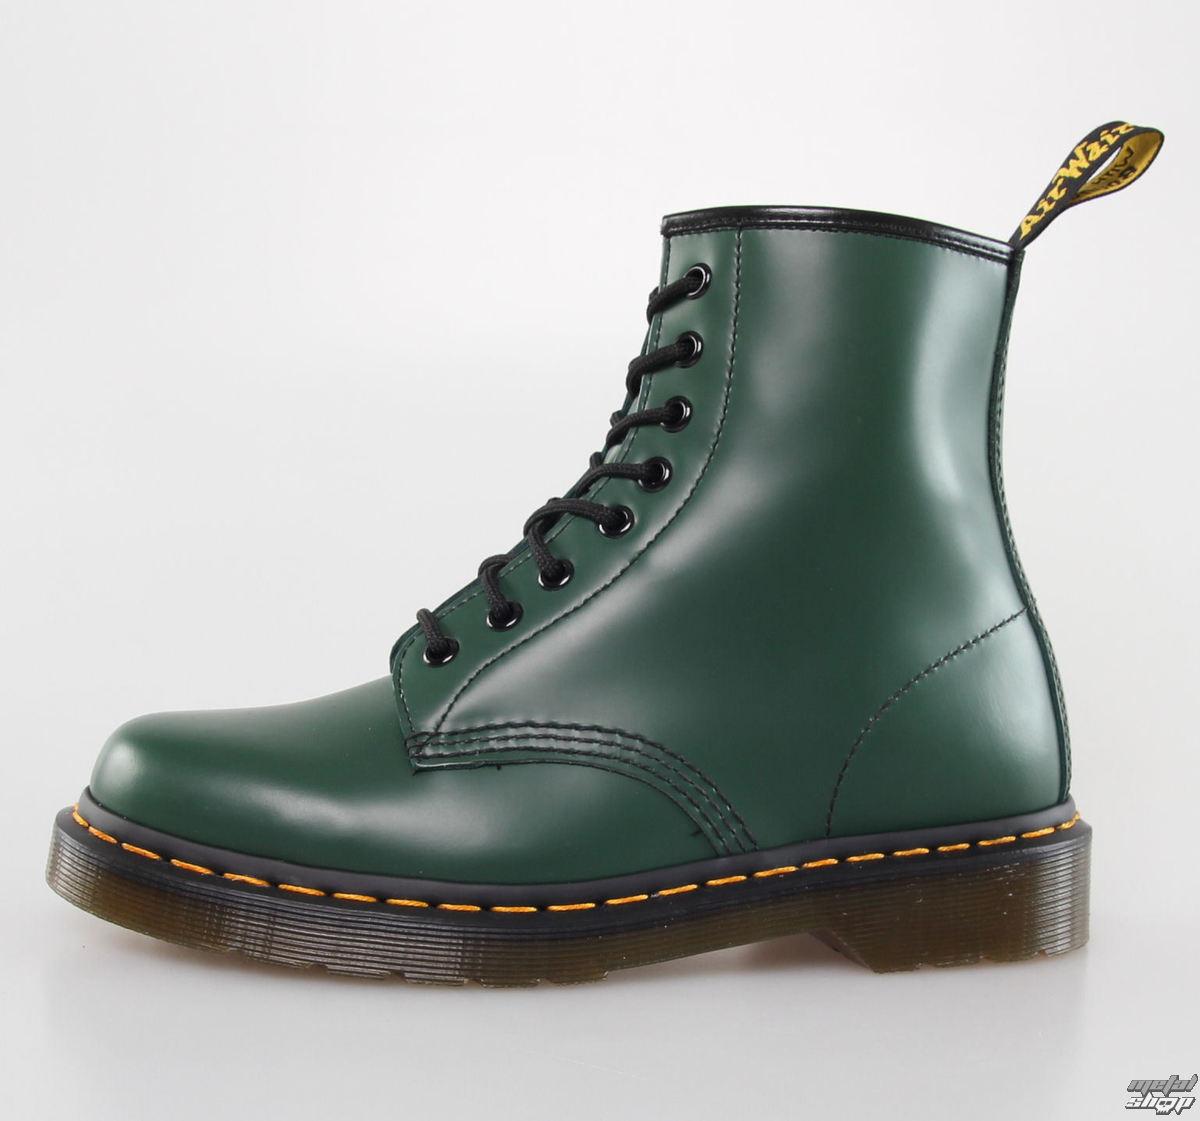 boty DR. MARTENS - 8 dírkové - 1460 - GREEN SMOOTH - DM10072310 ... 3ecf3bfd0b